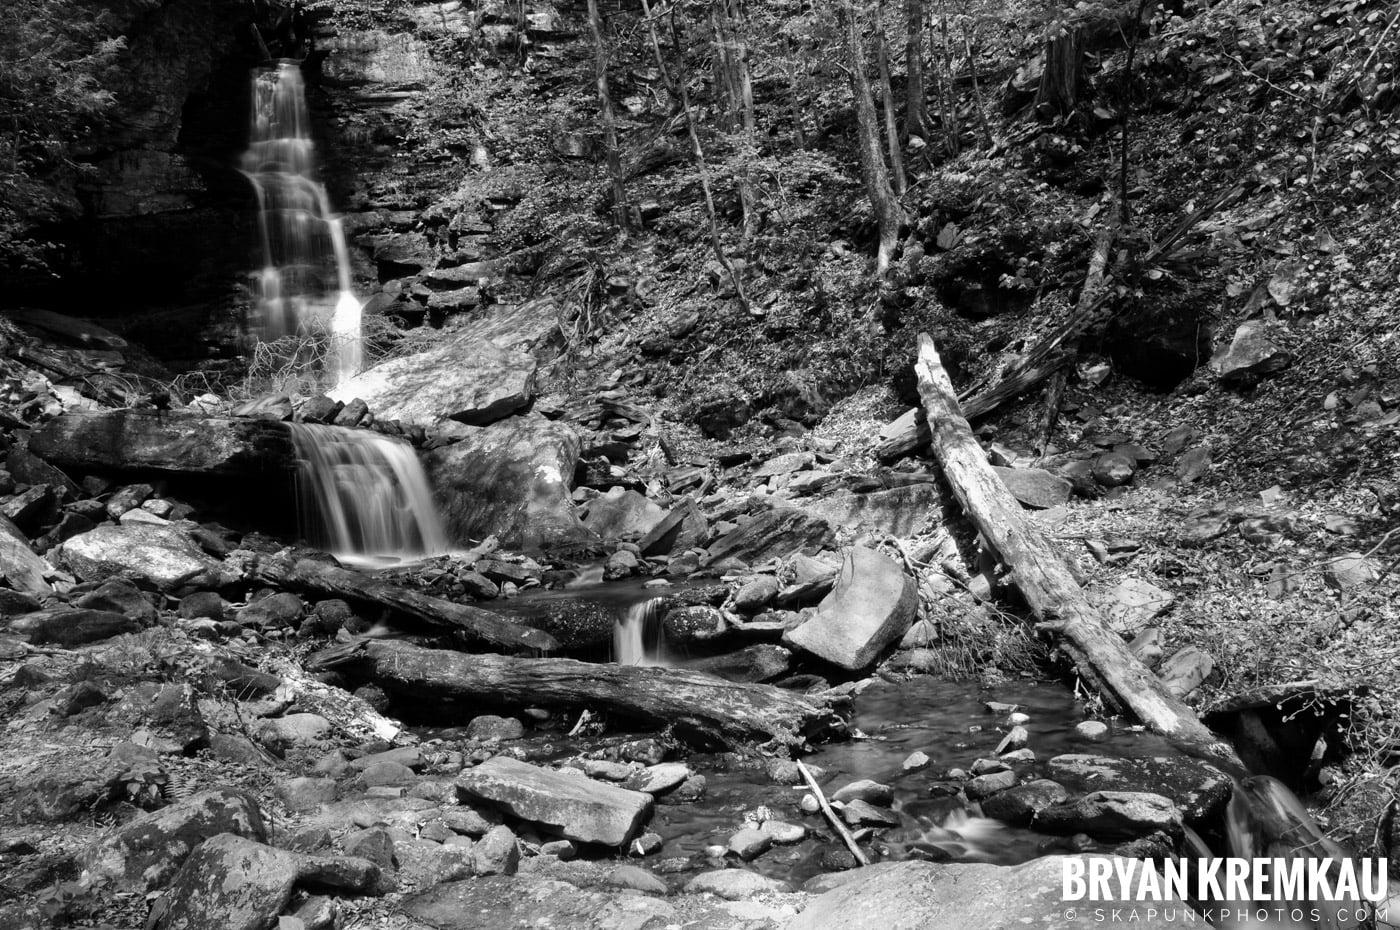 Getting Engaged @ Peekamoose Waterfall, Sundown NY - 5.1.10 (25)